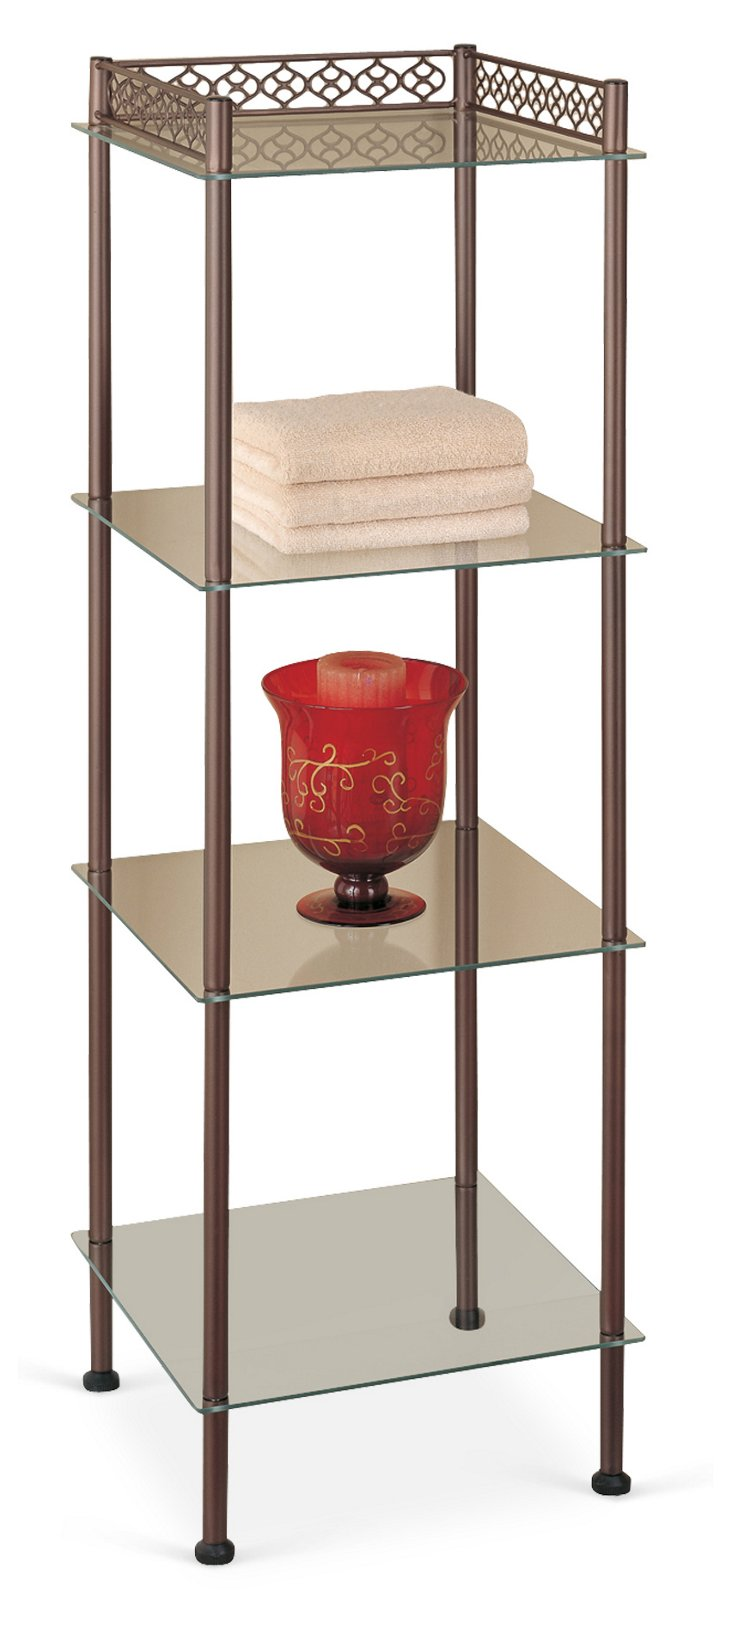 4-Tier Bronze Shelf Tower